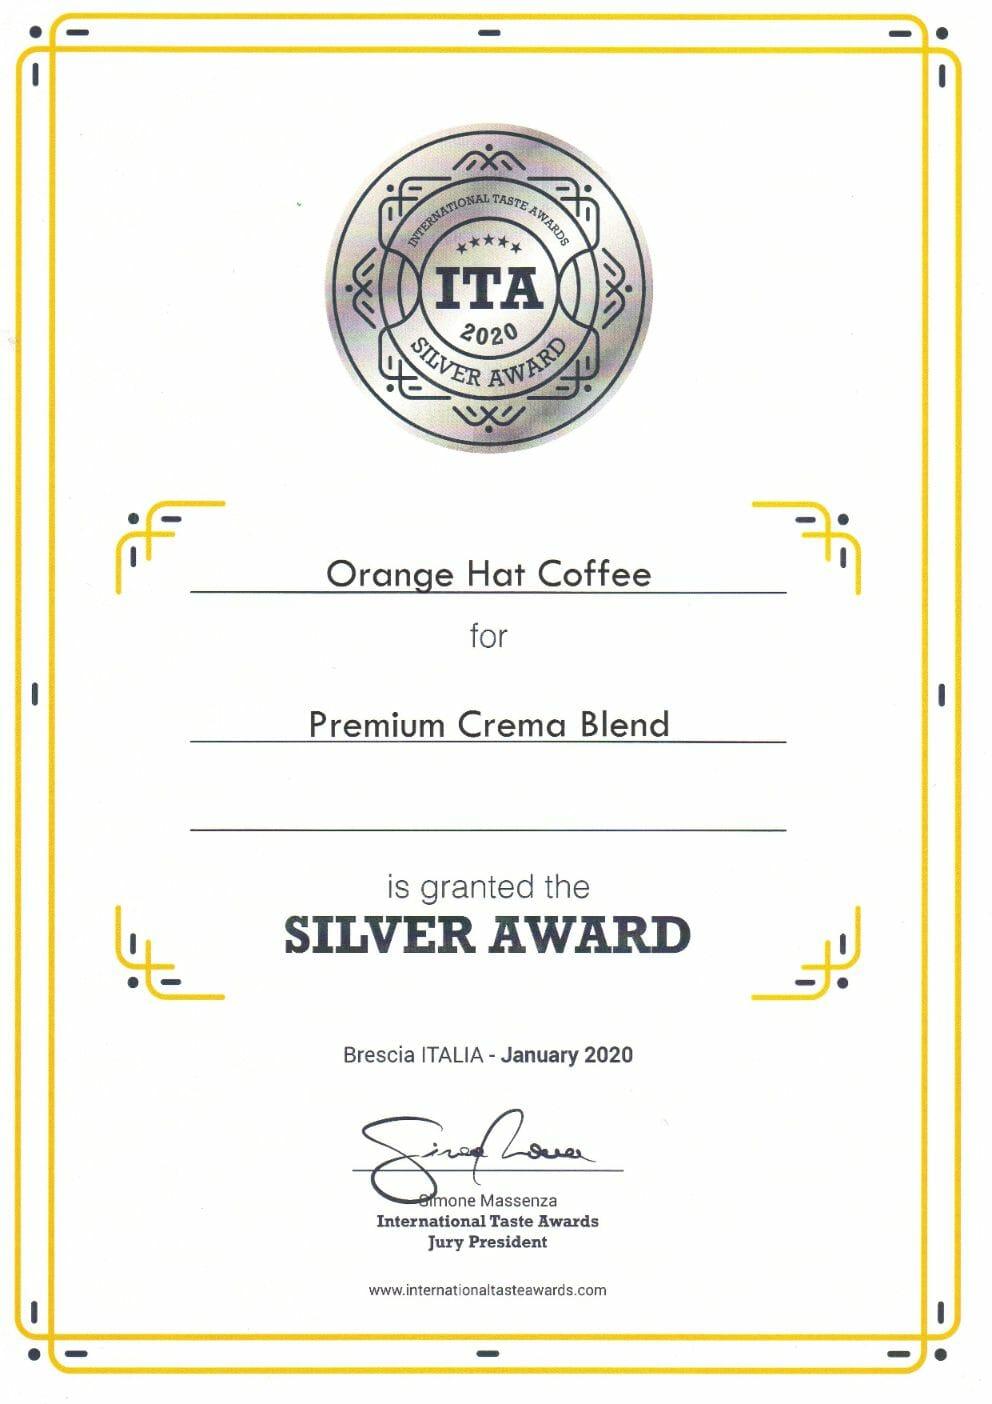 Orange Hat Coffee - International Taste Awards 2020 abalvošanas pasākumā! 9